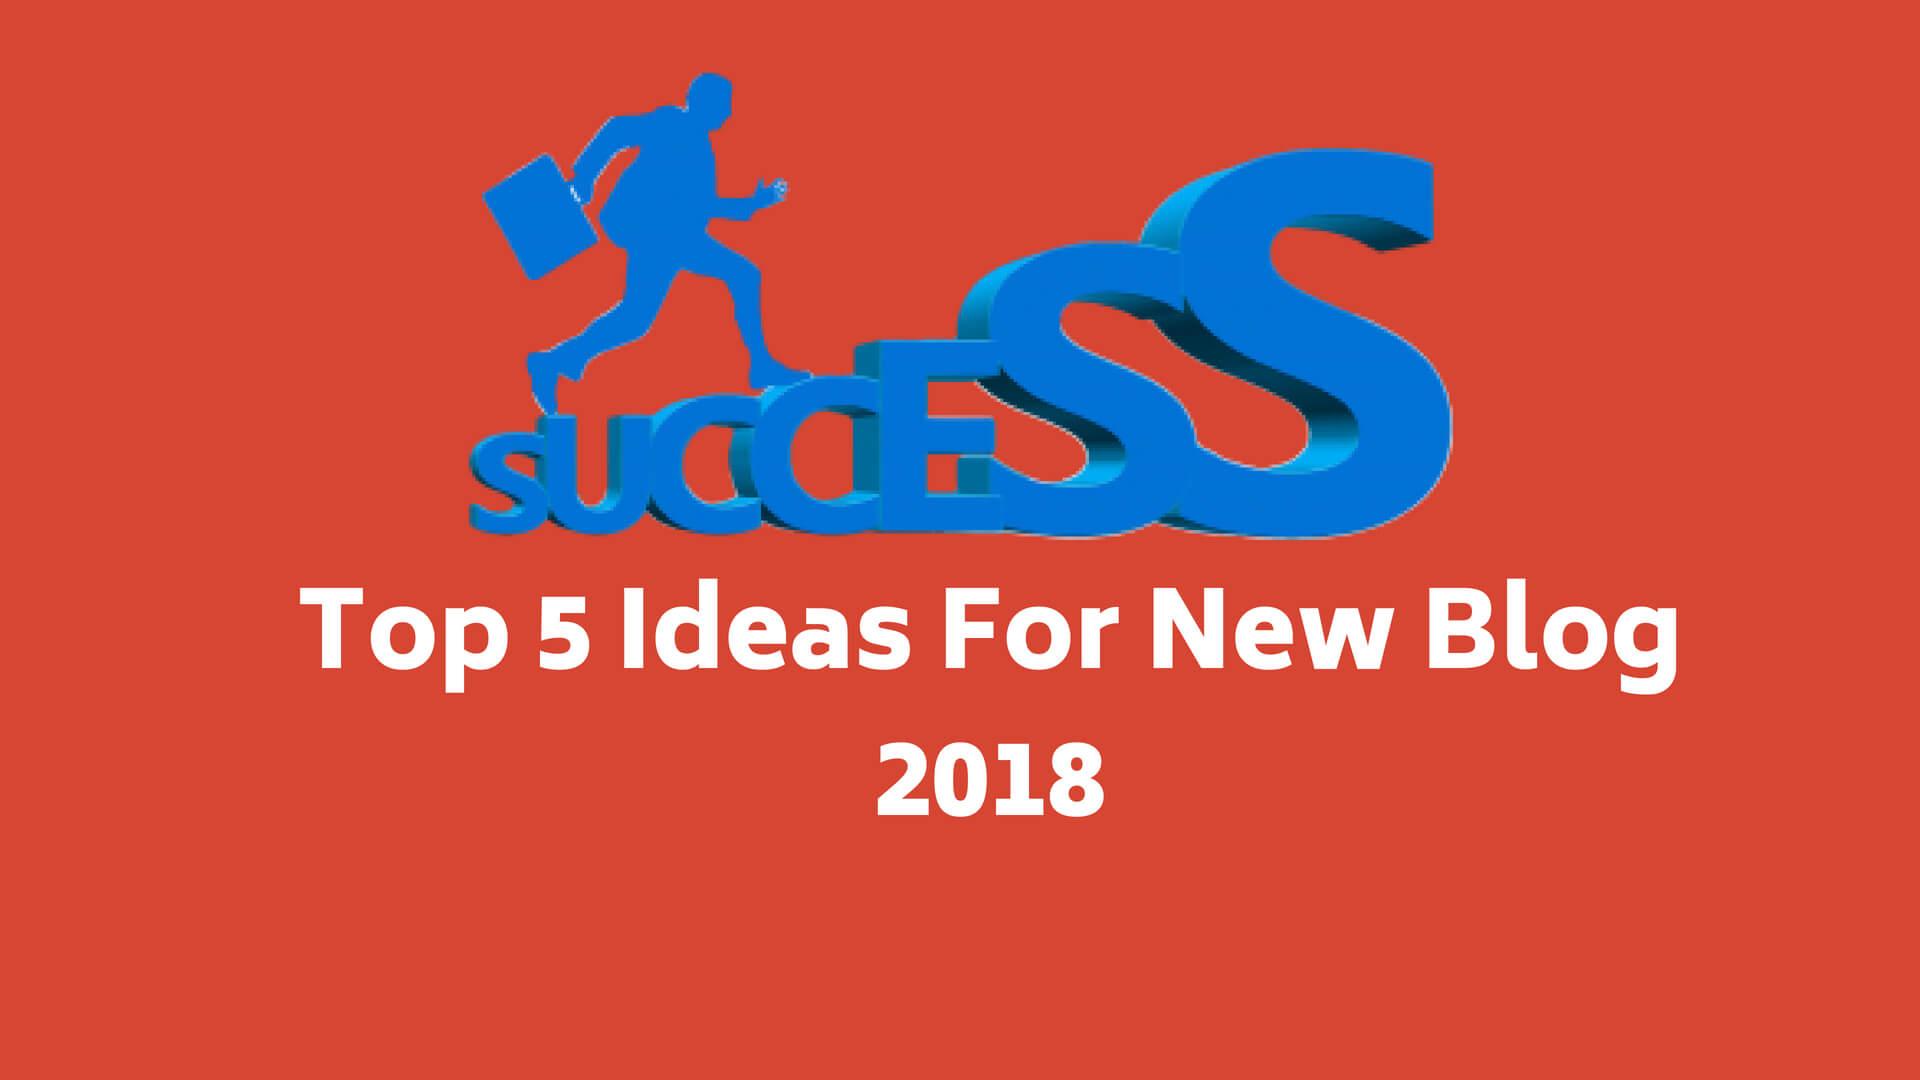 Kis Topic Par Blog Banaye? |  Top 5 Ideas For New Blog